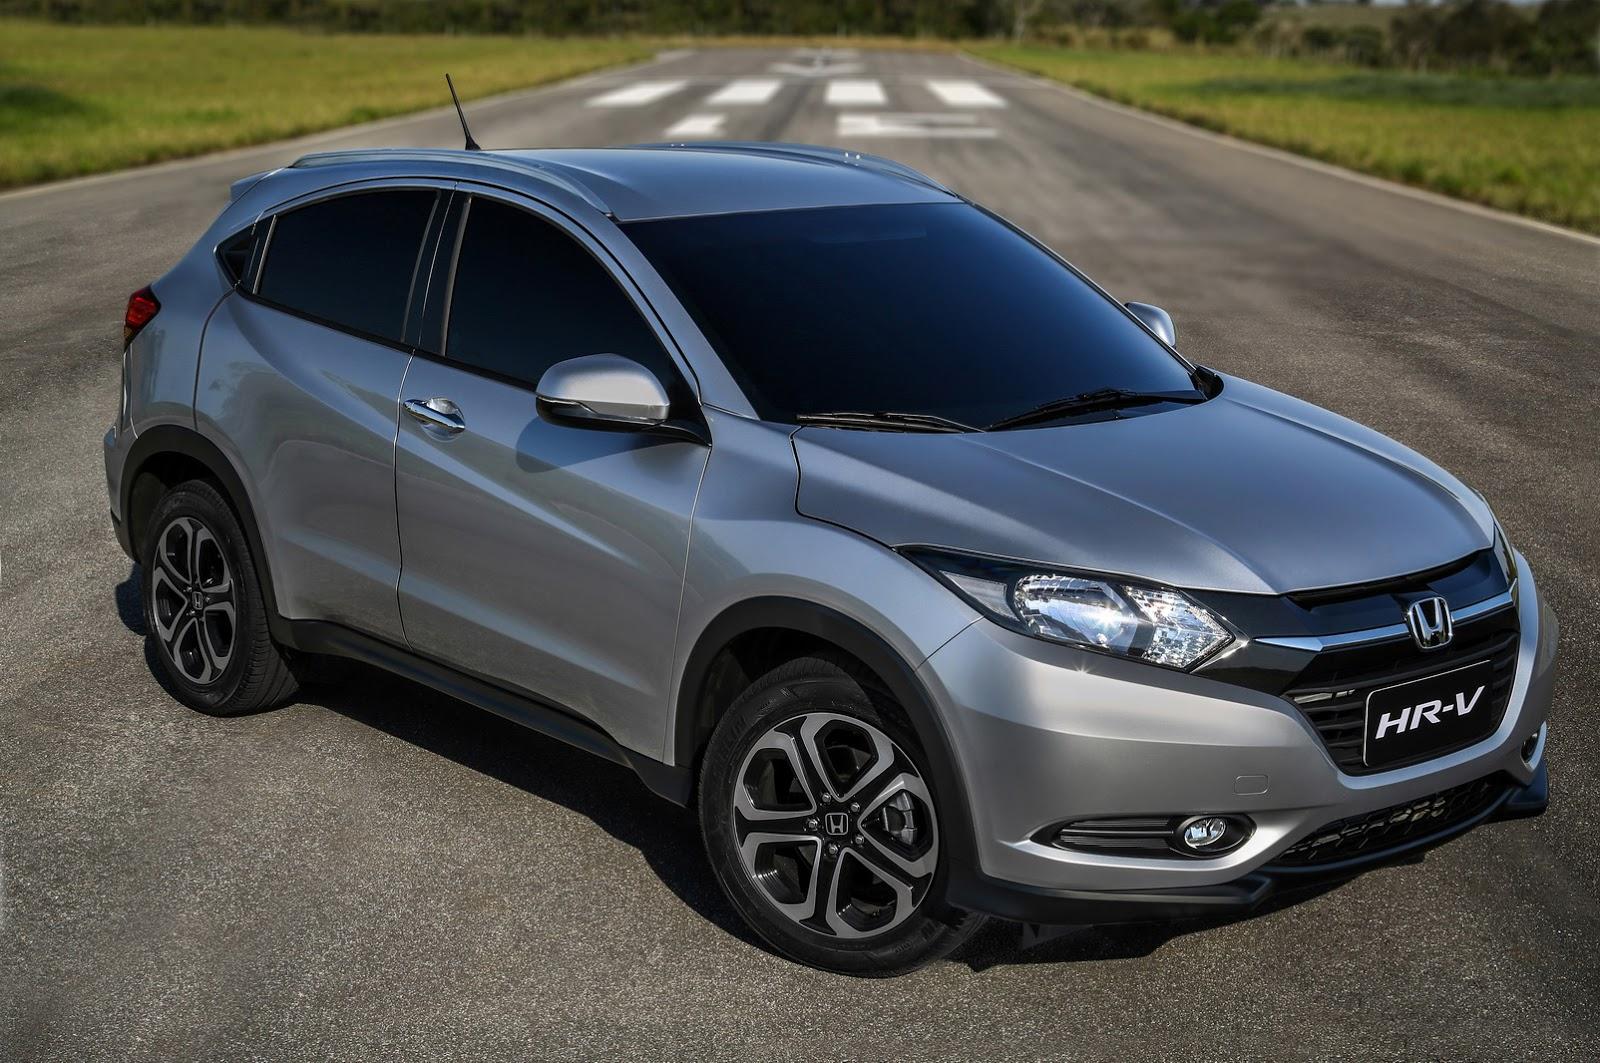 Honda S New Hr V Makes Its Brazilian Debut With 1 8l Flex